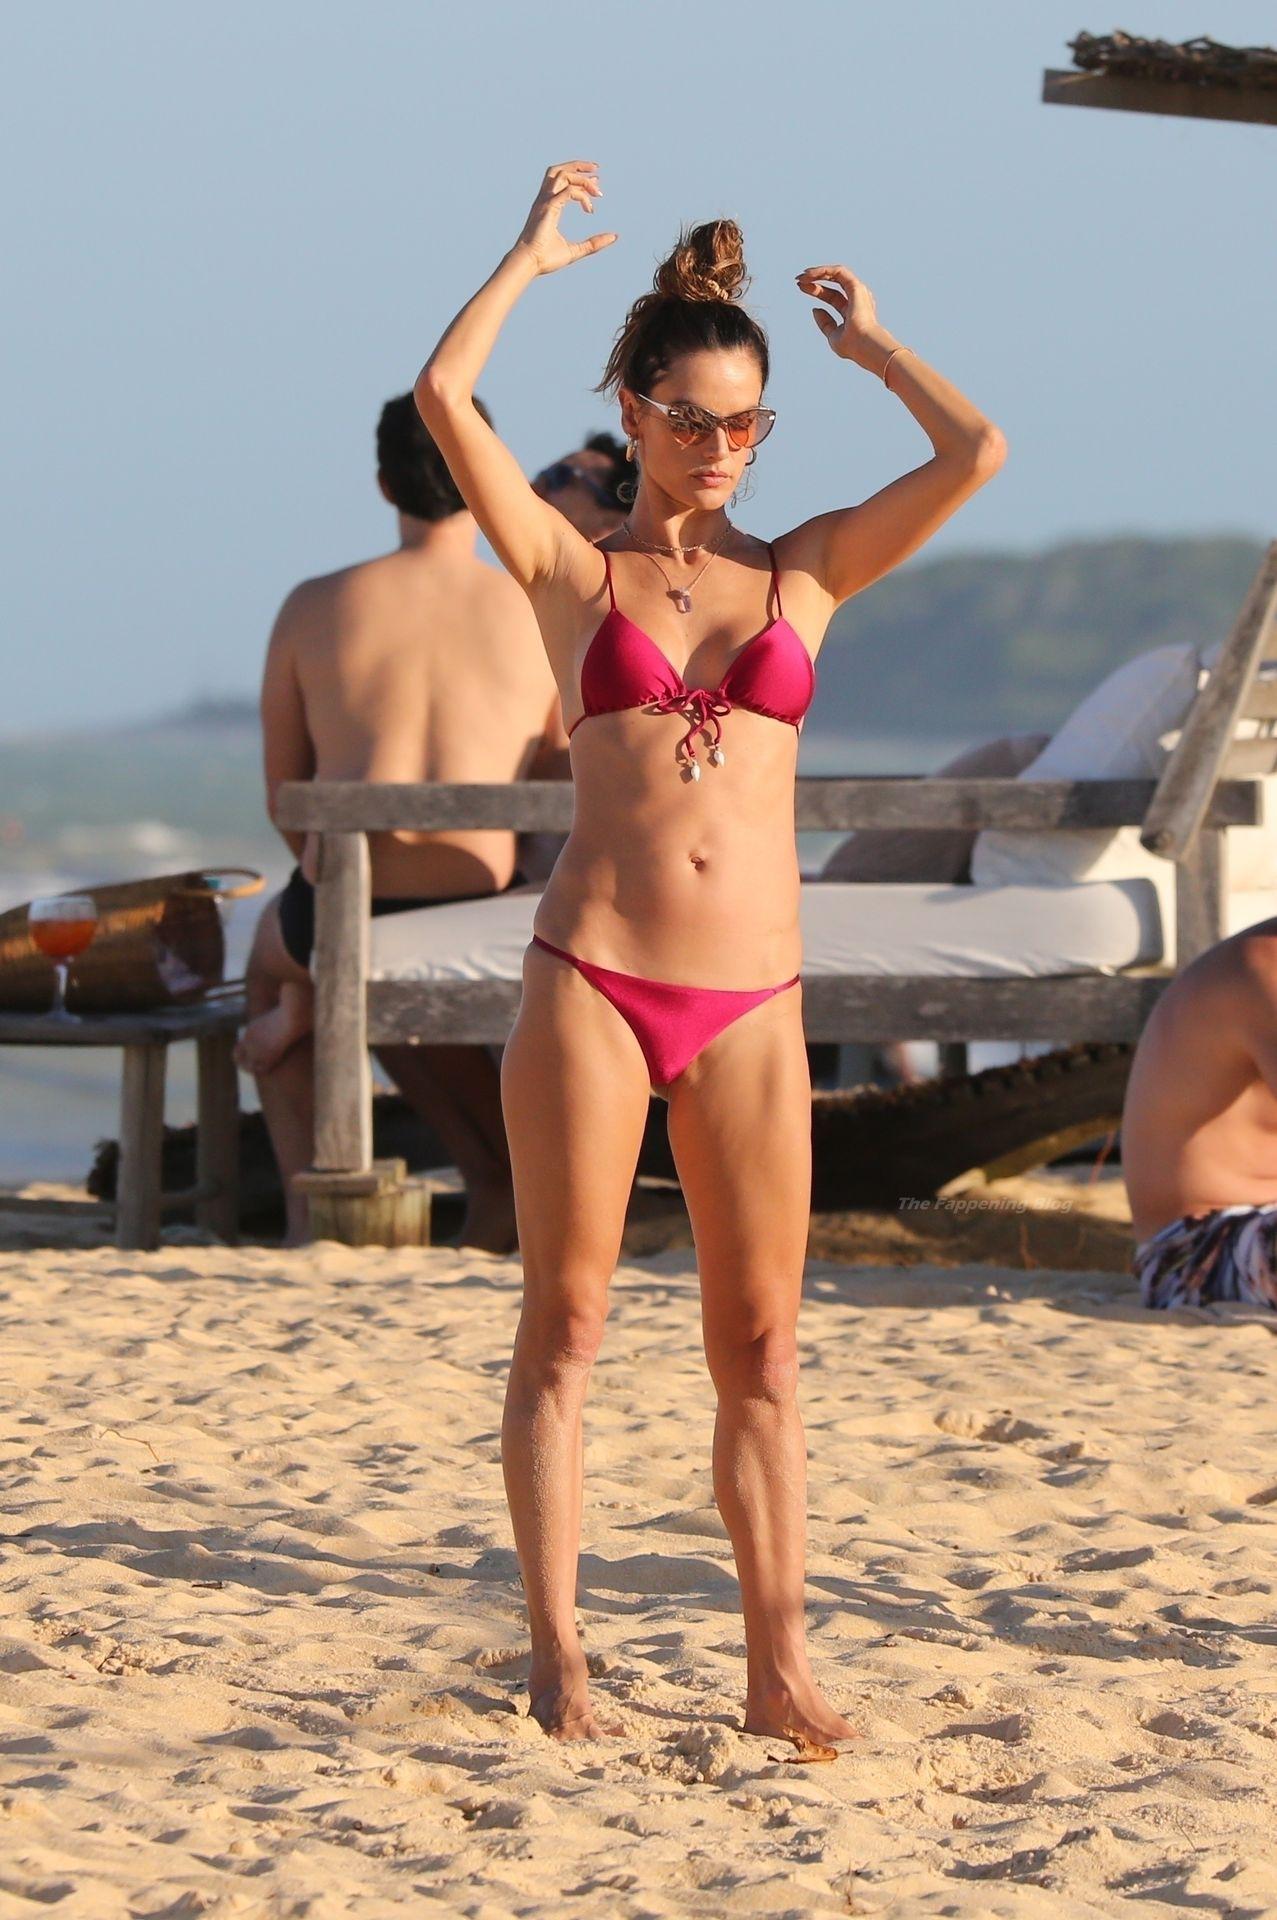 Alessandra-Ambrosio-Sexy-65-thefappeningblog.com_-1.jpg